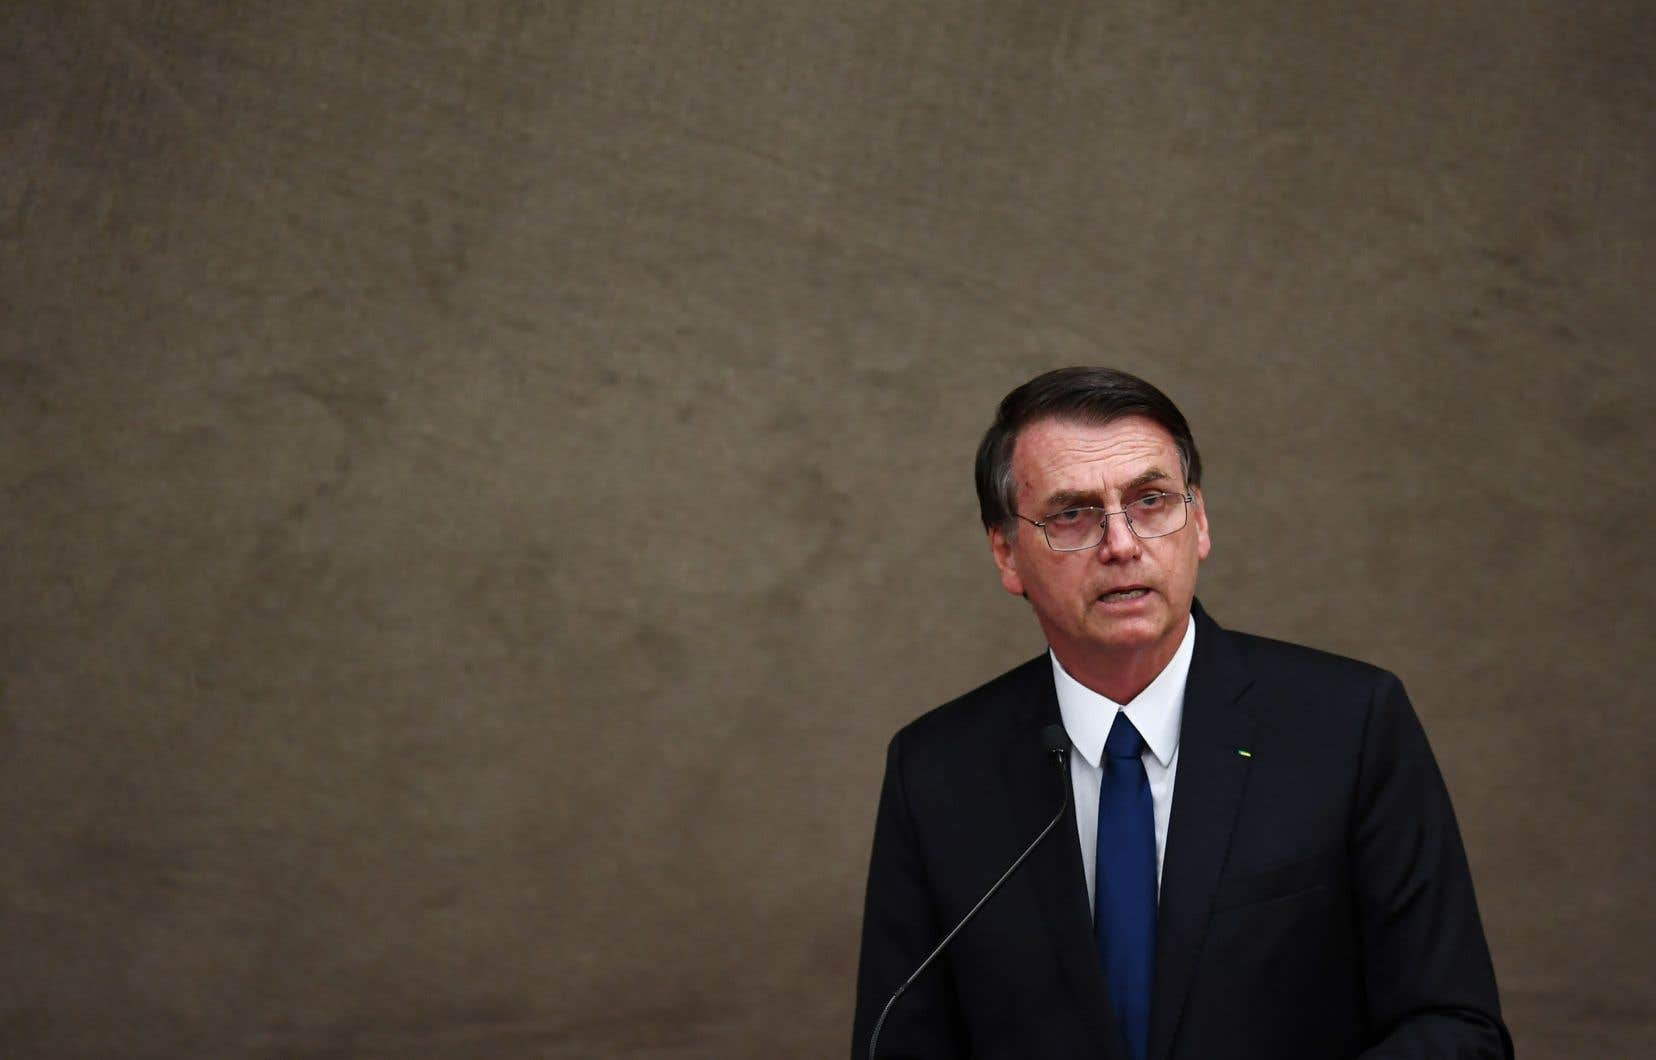 Le président brésilien, Jair Bolsonaro